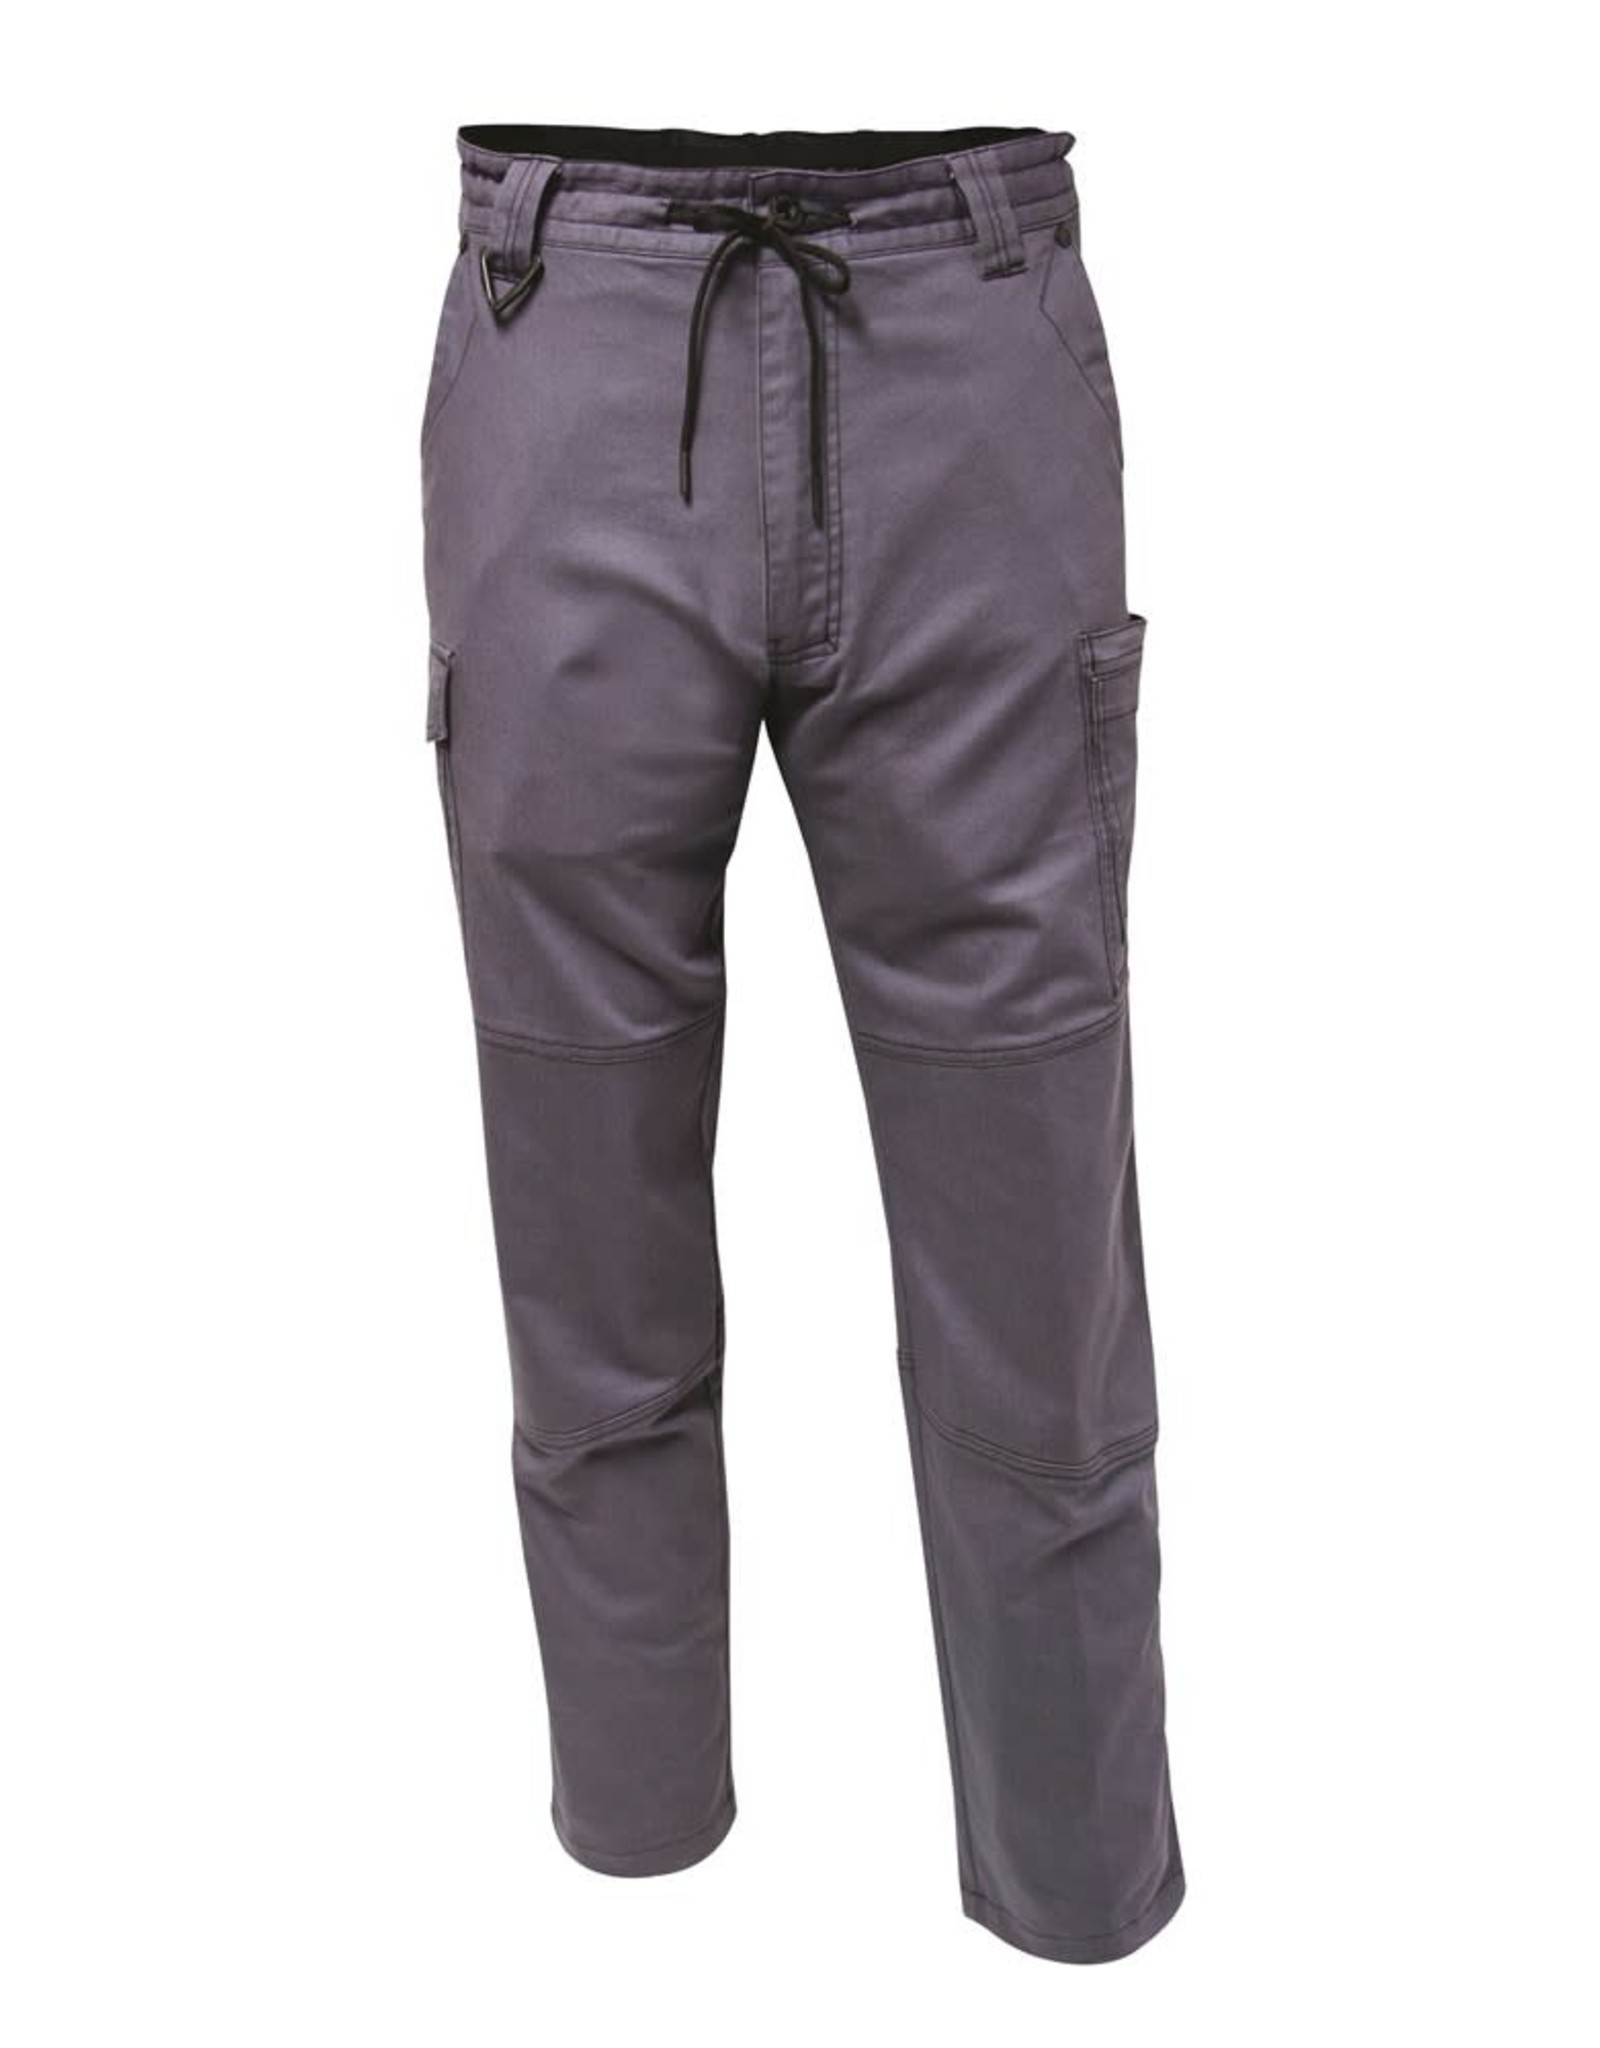 Mack Mack Workwear Alloy Stretch Cargo Pants